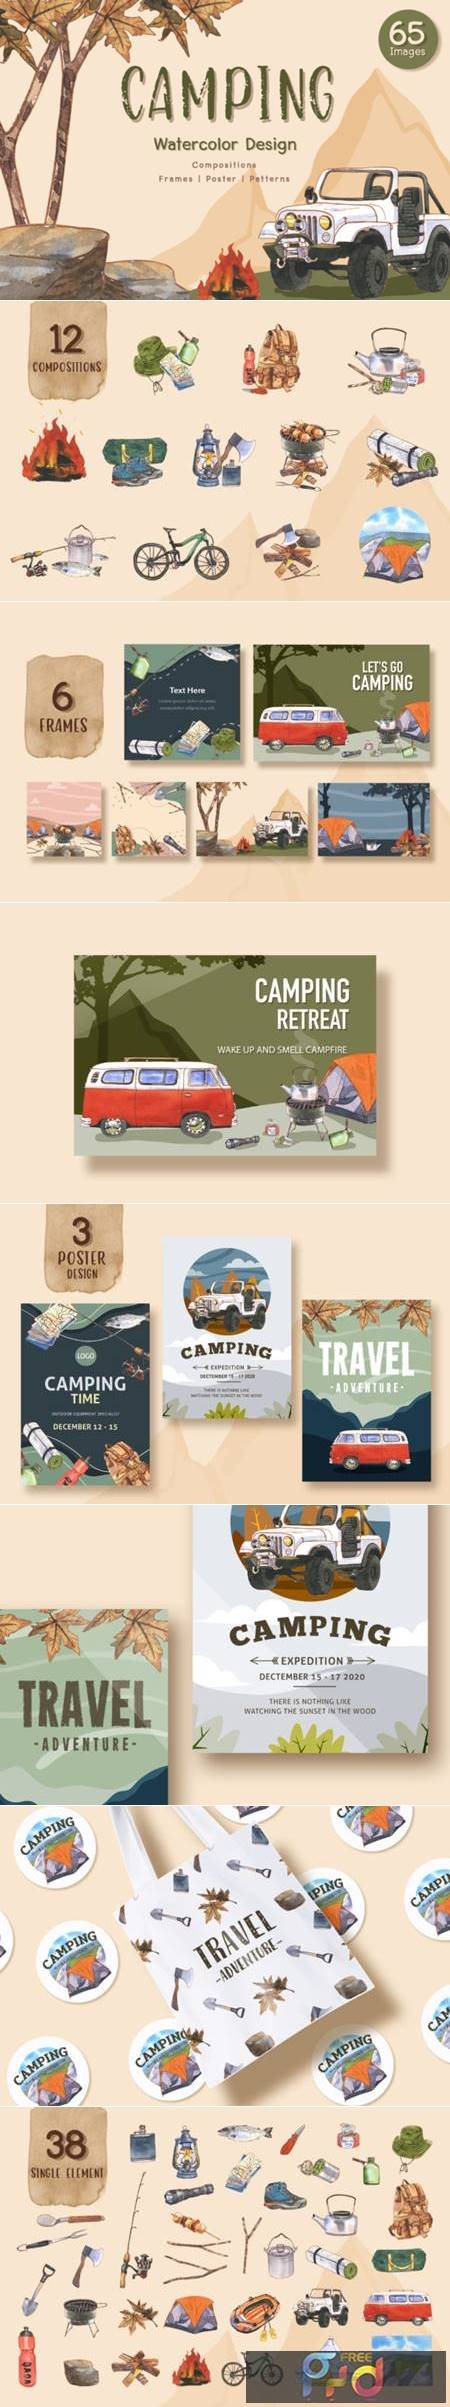 Camping Travel Watercolor Set 4862432 1